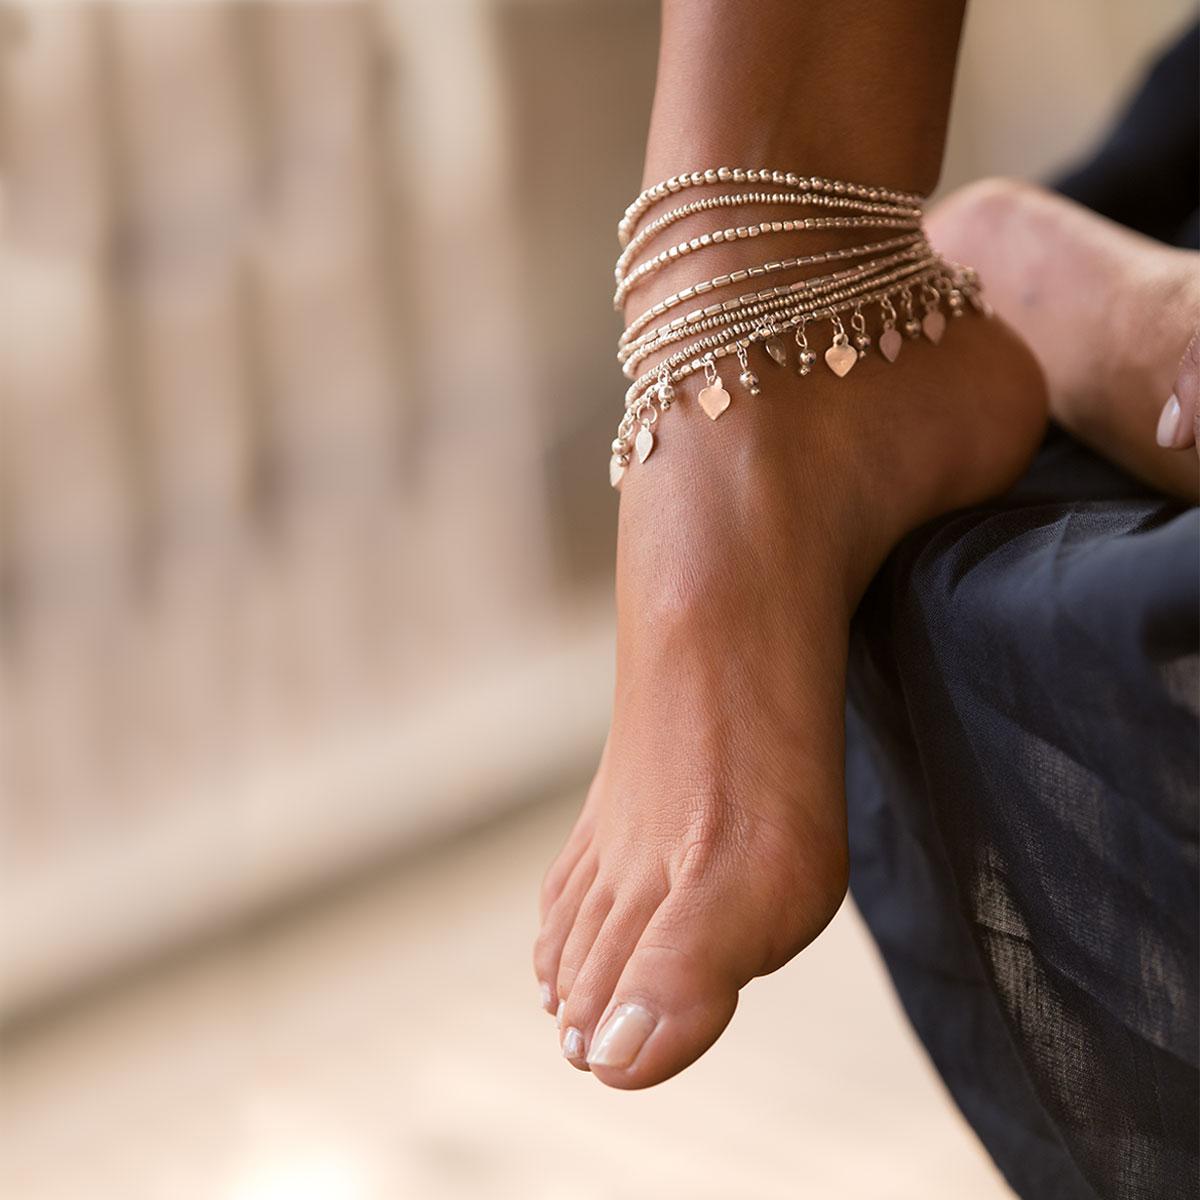 Summer 2018 fashion trend: Anklets and Ankle Bracelets ...